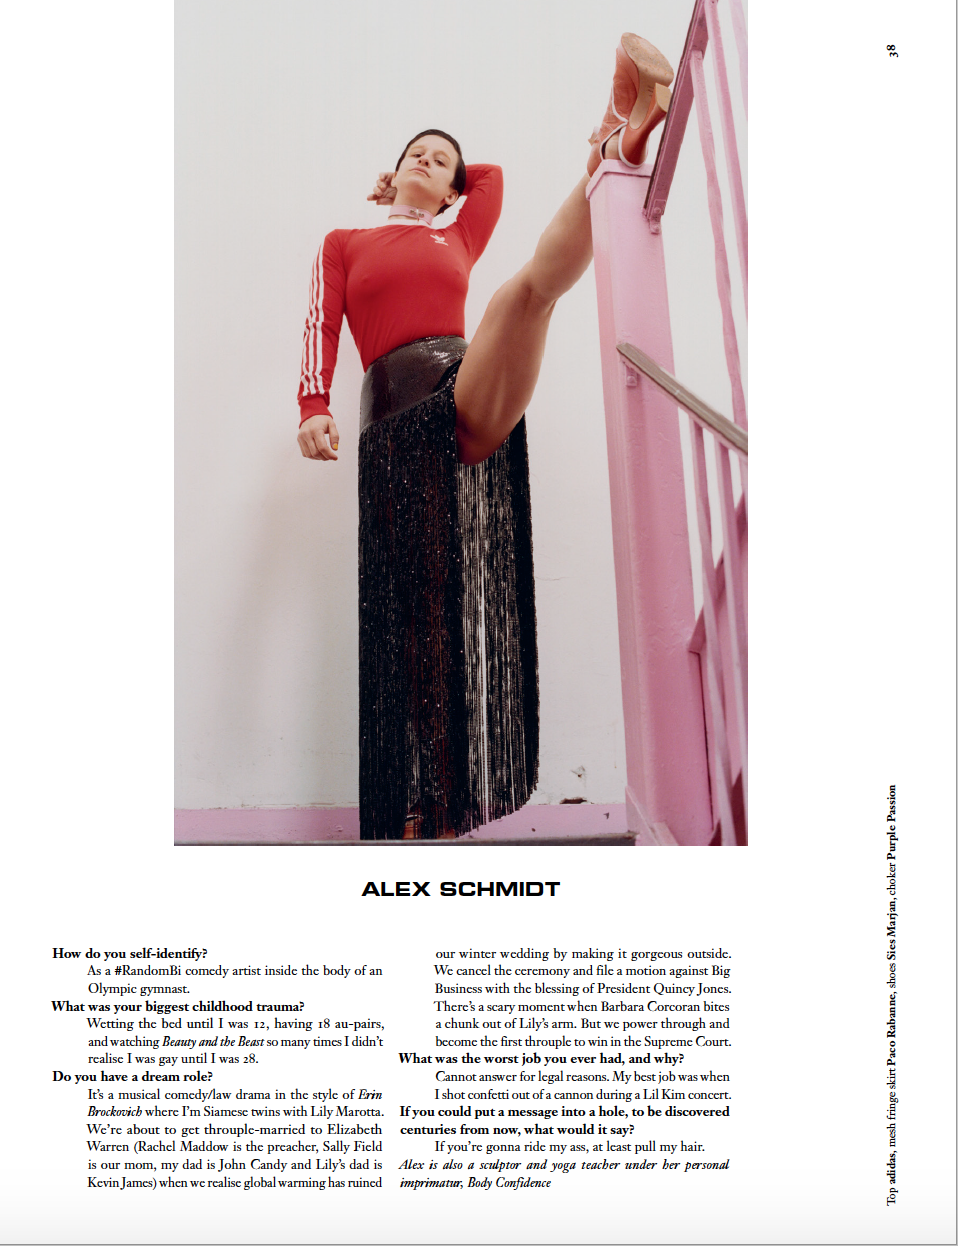 Interview by Patrik Sandberg for DAZED magazine. Photos by Hart + Leshkima.